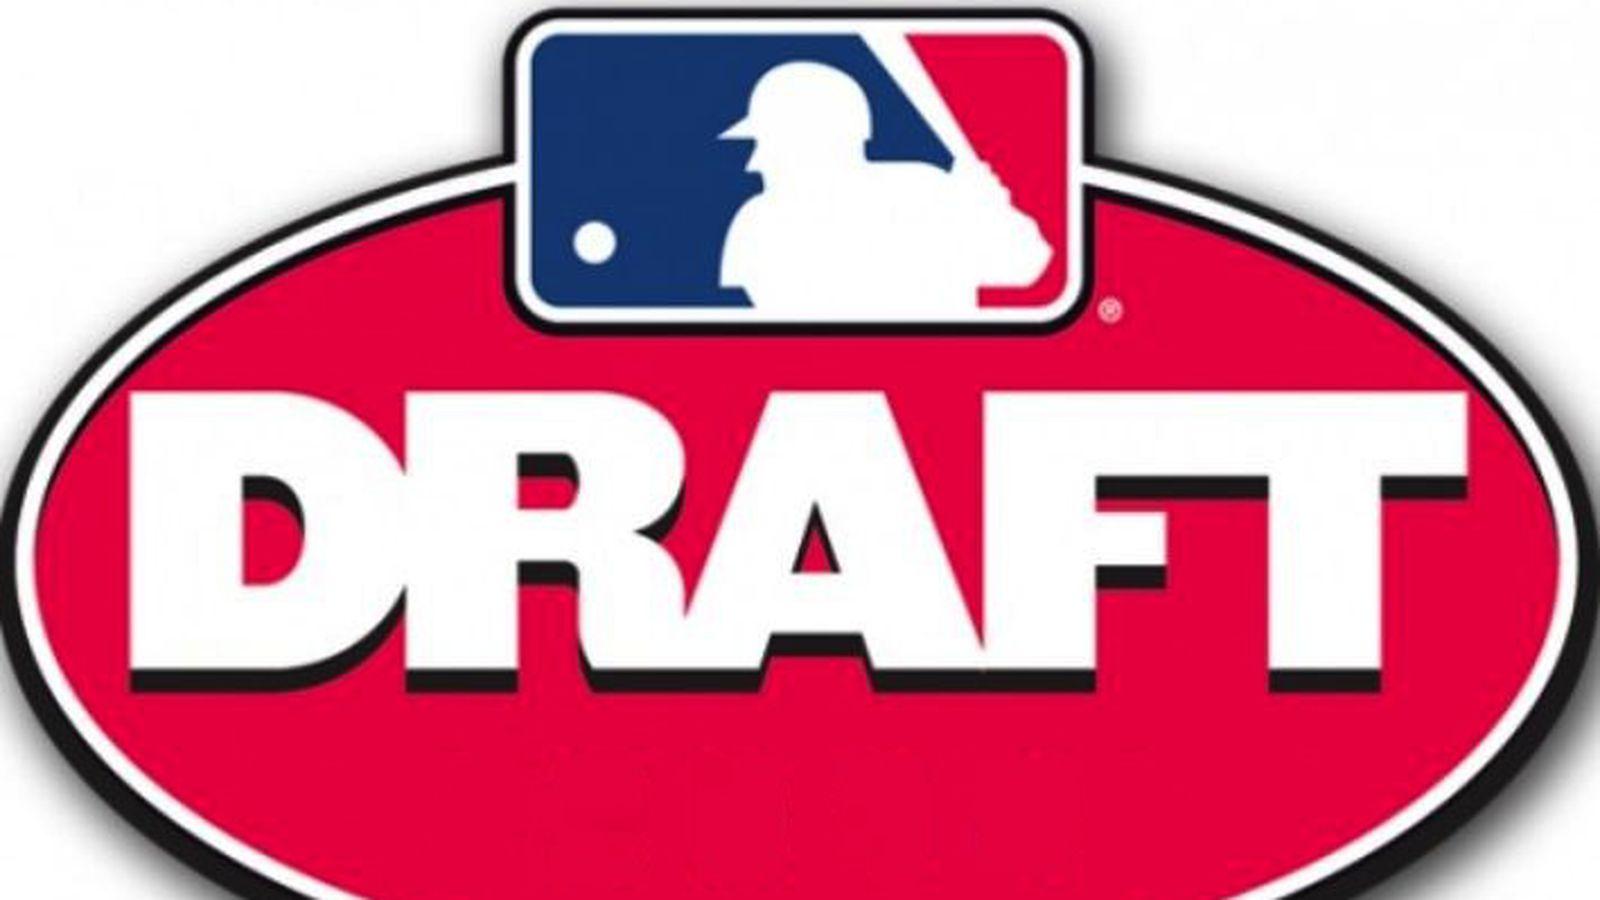 2014-draft.0.0.0